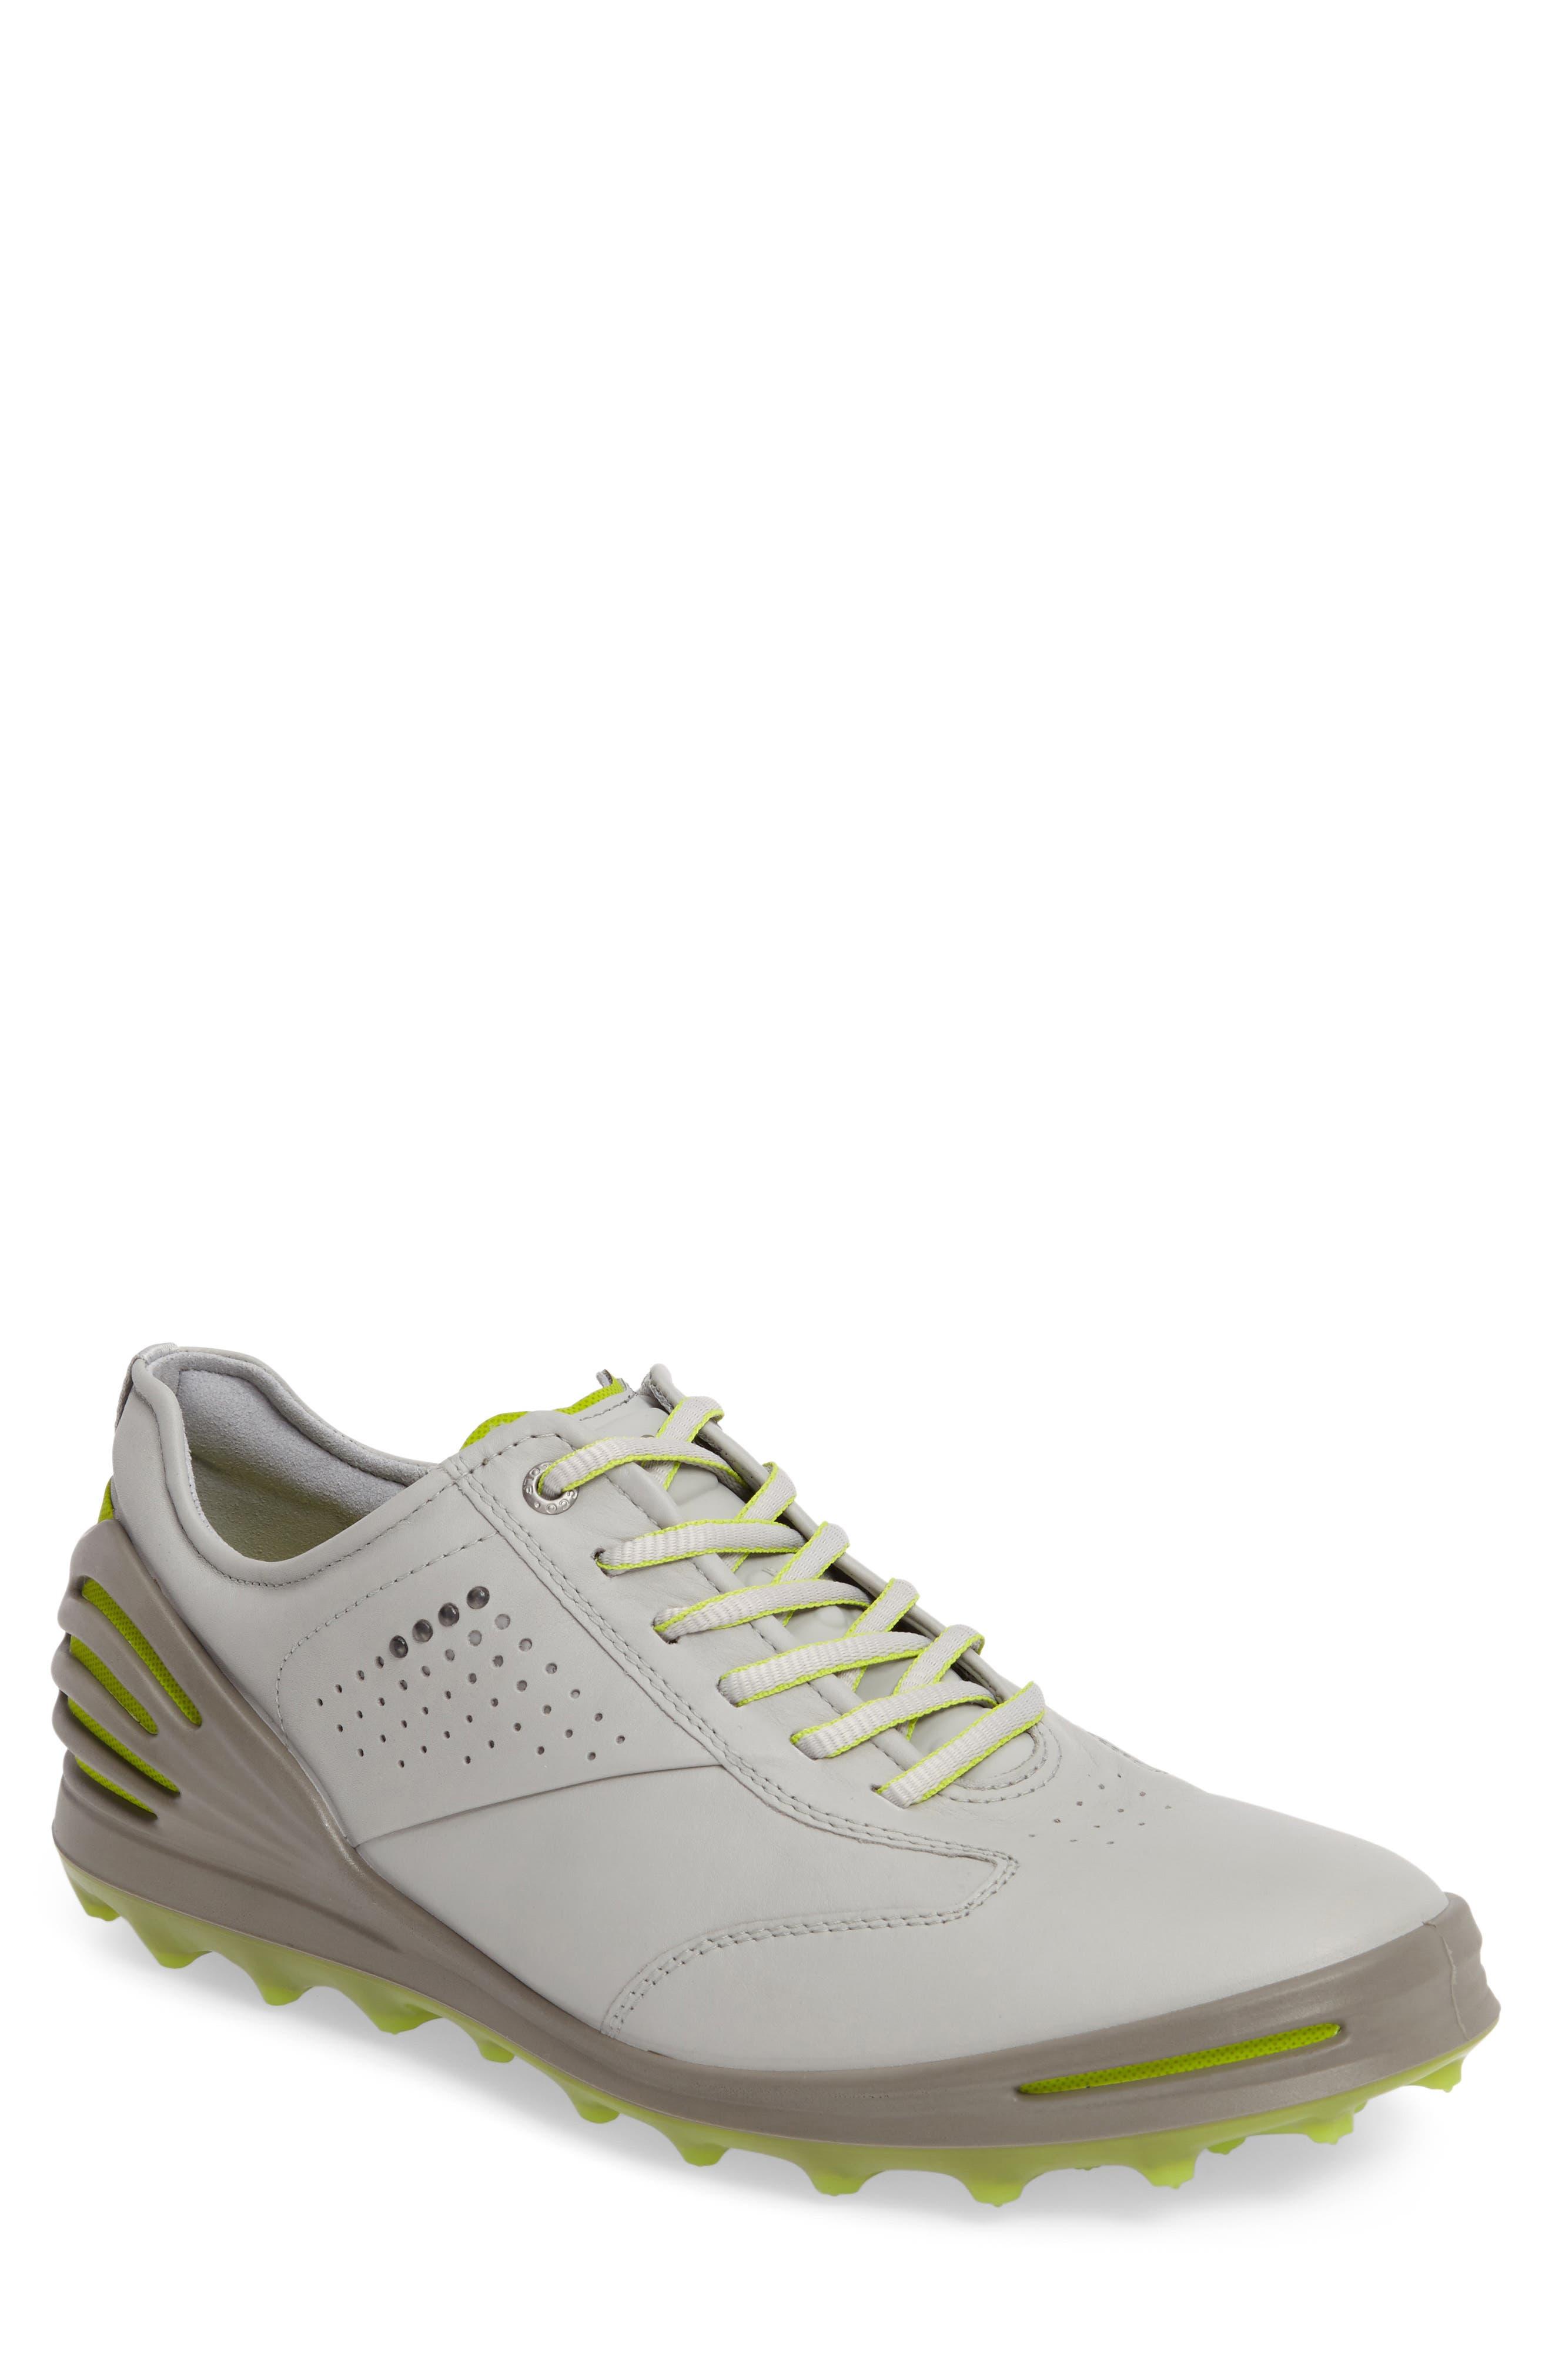 Main Image - ECCO Cage Pro Golf Shoe (Men)